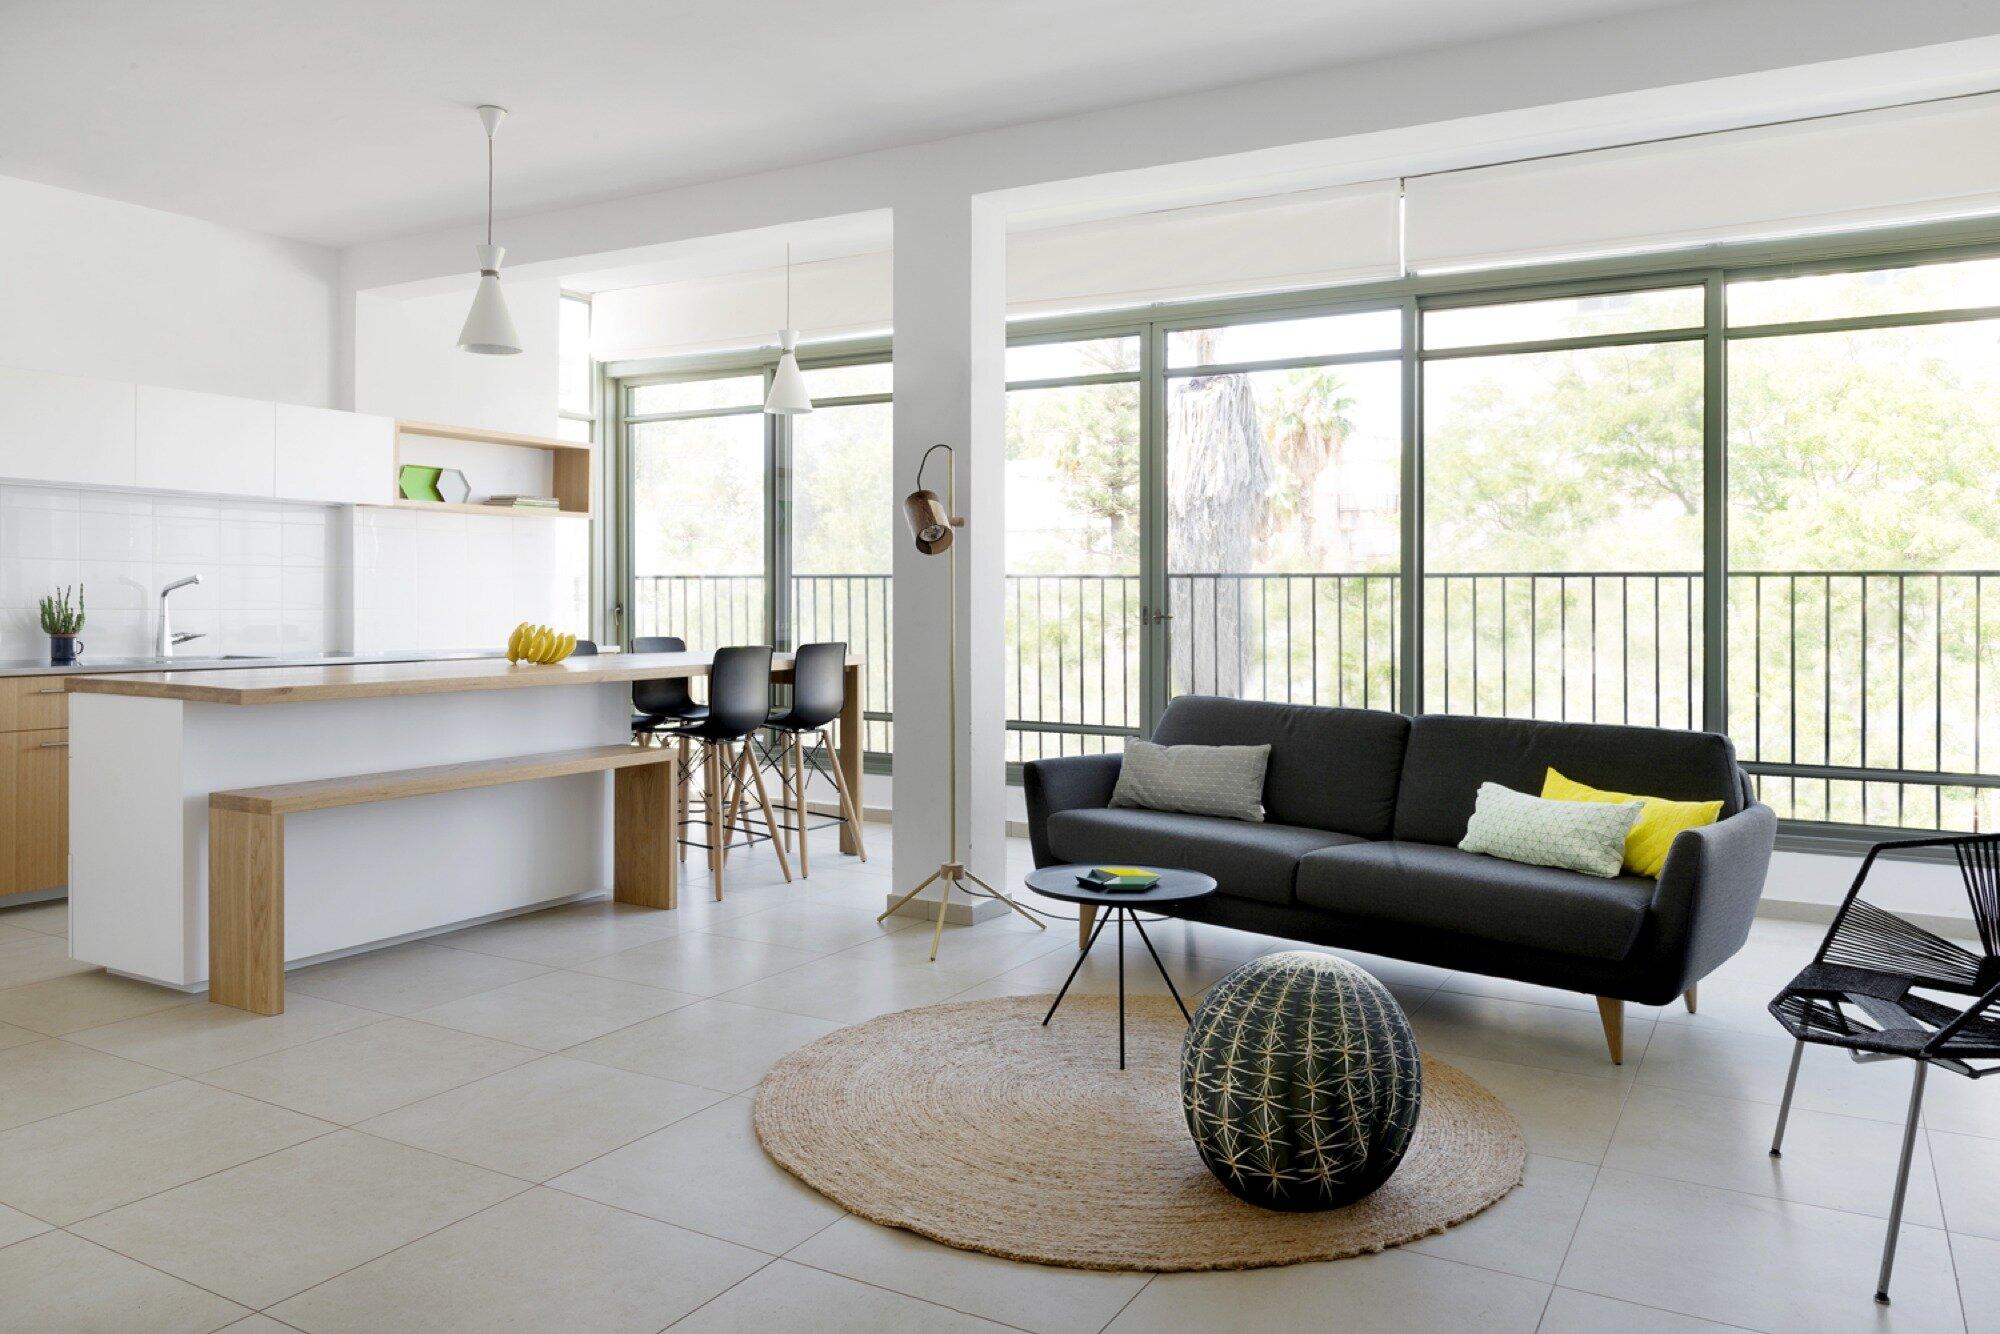 Apartment in Ramat Gan - Itai Palti - Israel - Kitchen and Living Room - Humble Homes